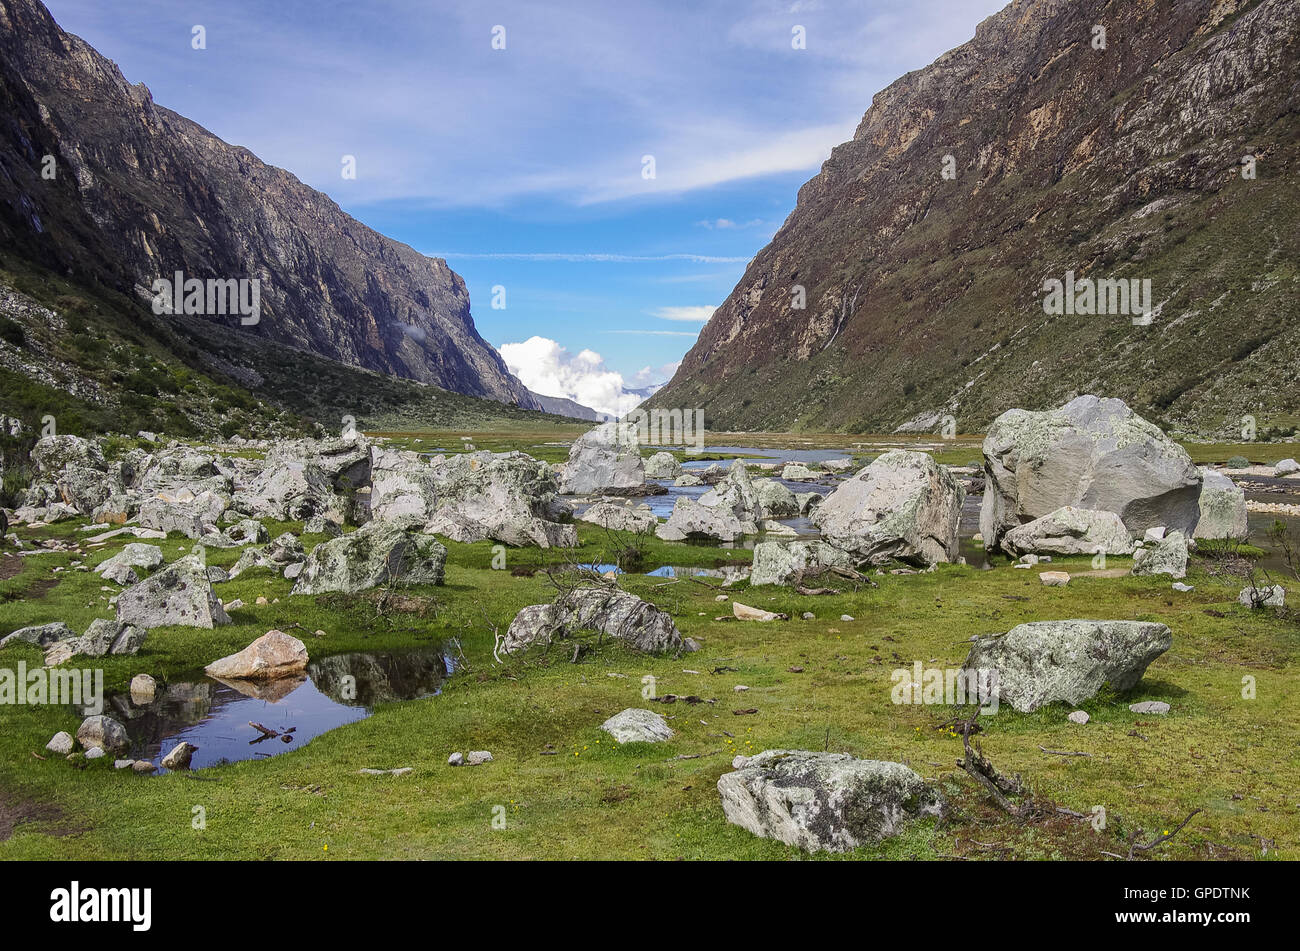 Mountain valley and river. Huascaran National Park, Cordillera Blanca - Santa Cruz Circuit Trekking. Peru Stock Photo